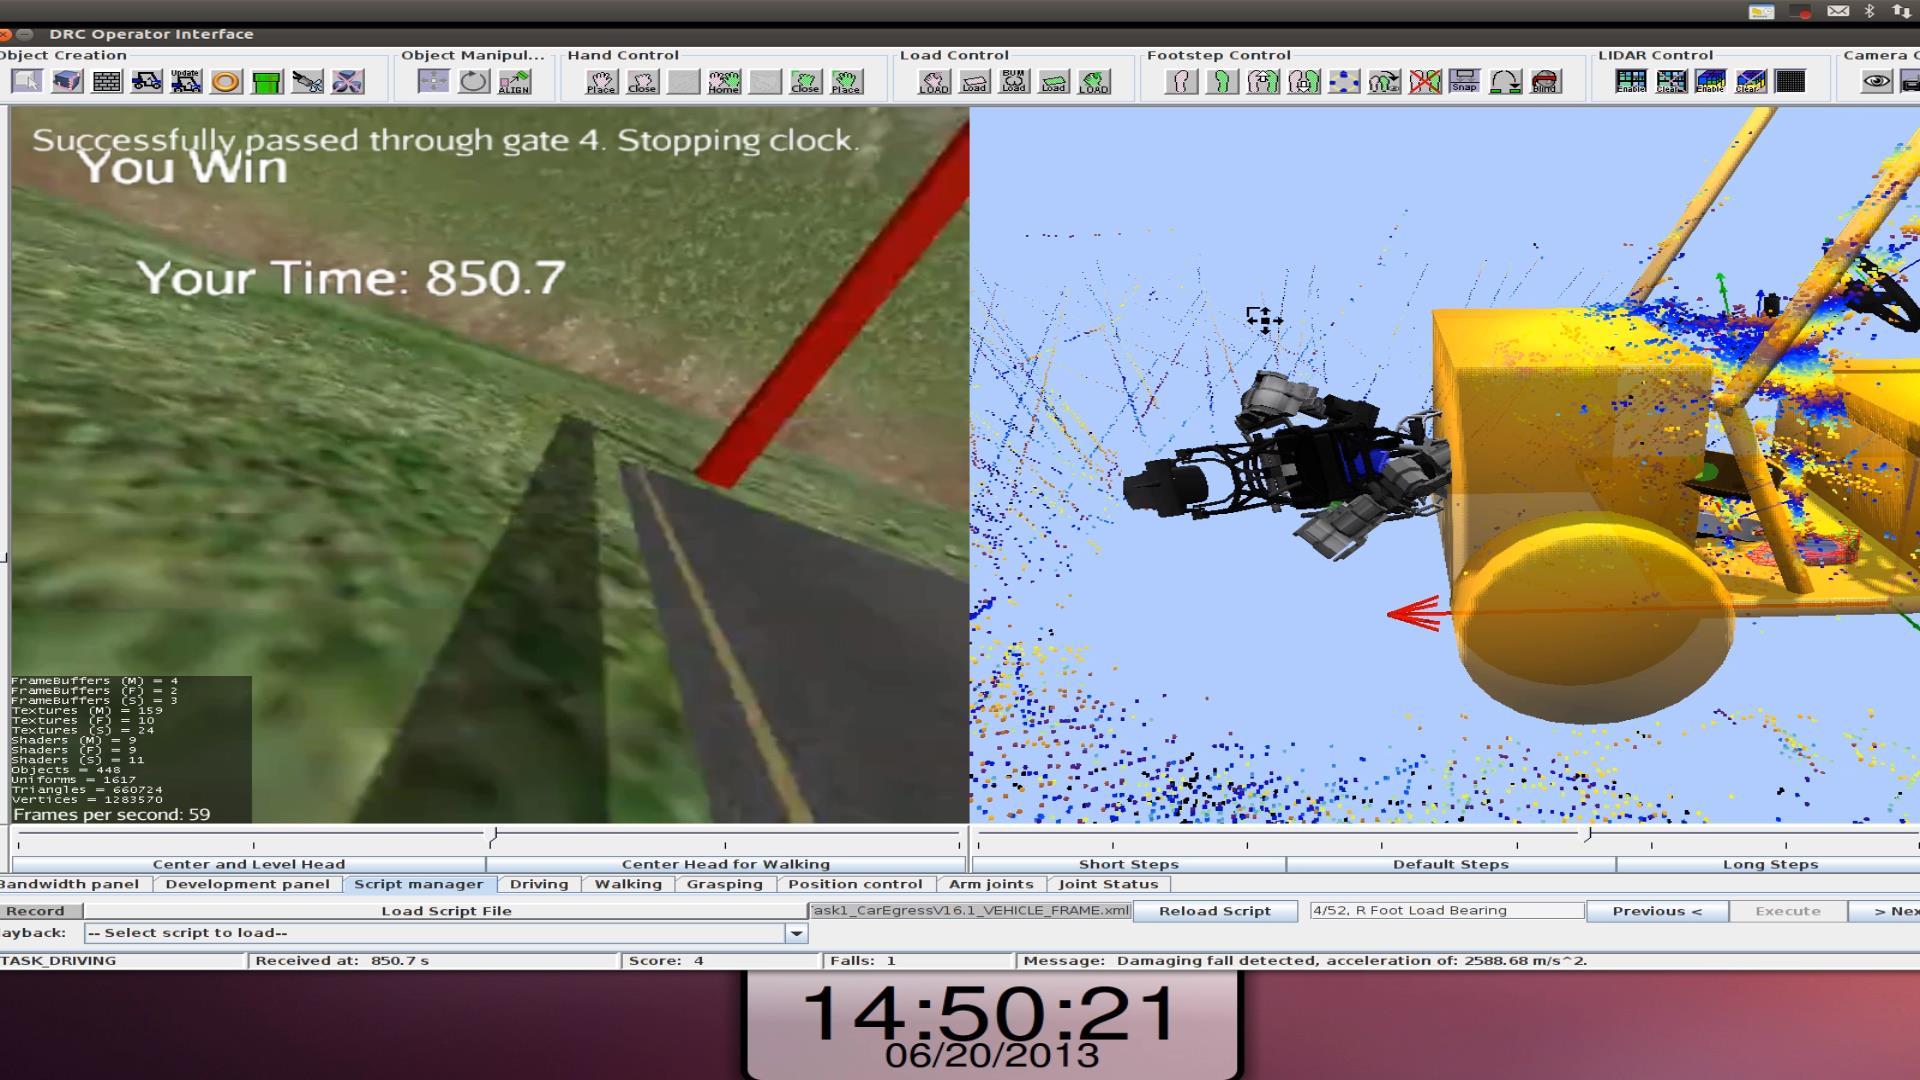 vrc_final_run13_driving (Subclip2).jpg